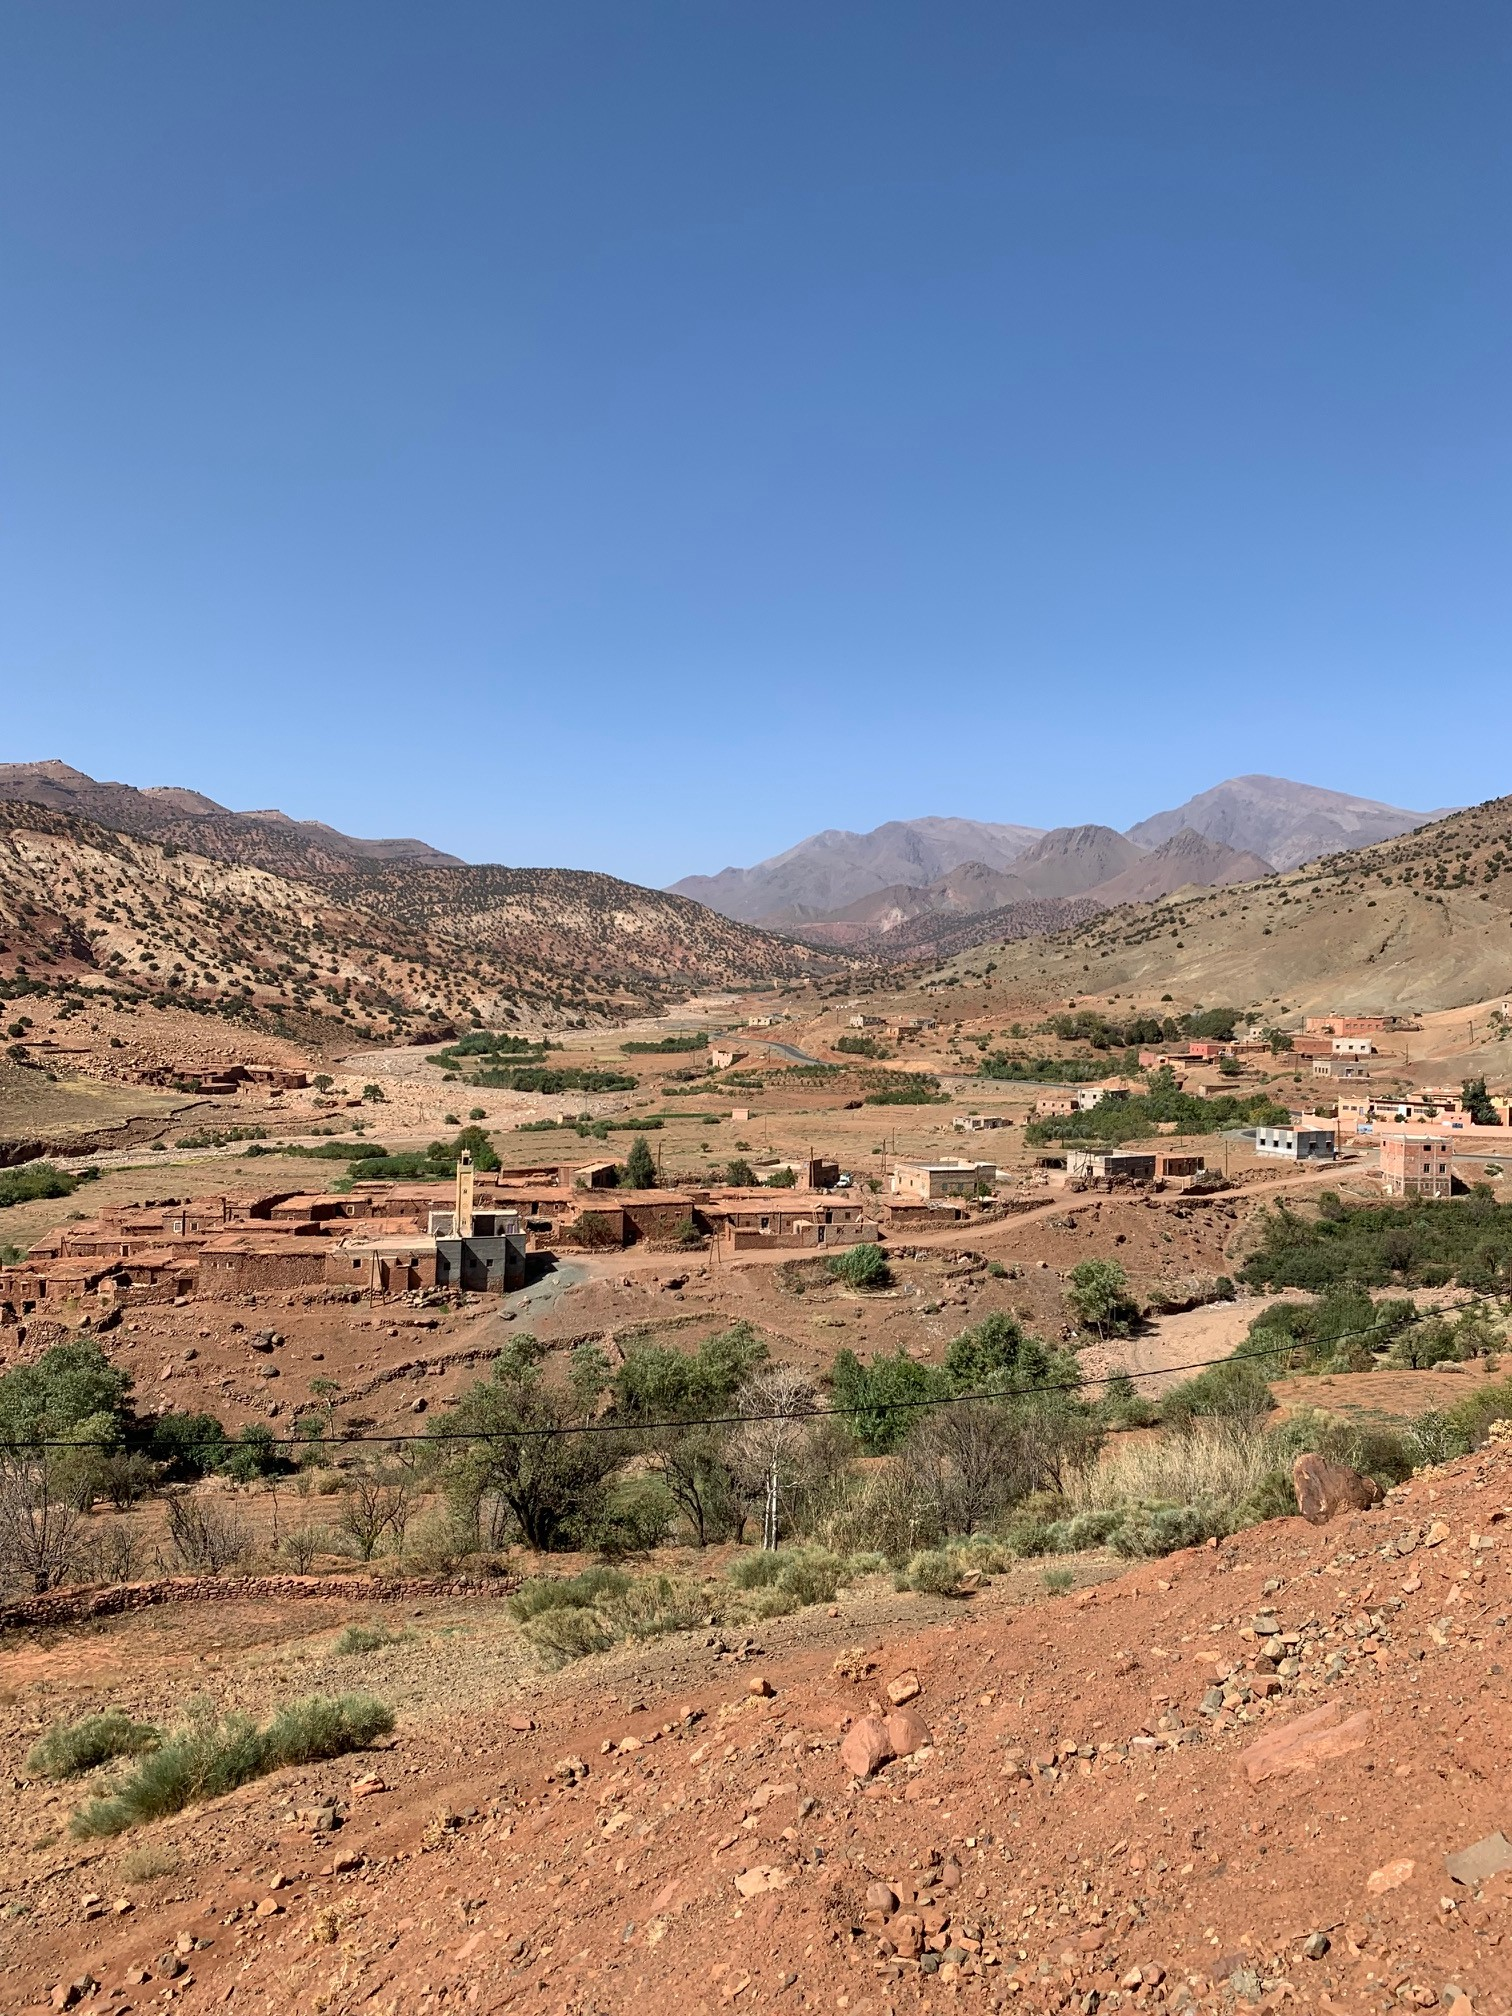 morocco, the-alyst.com